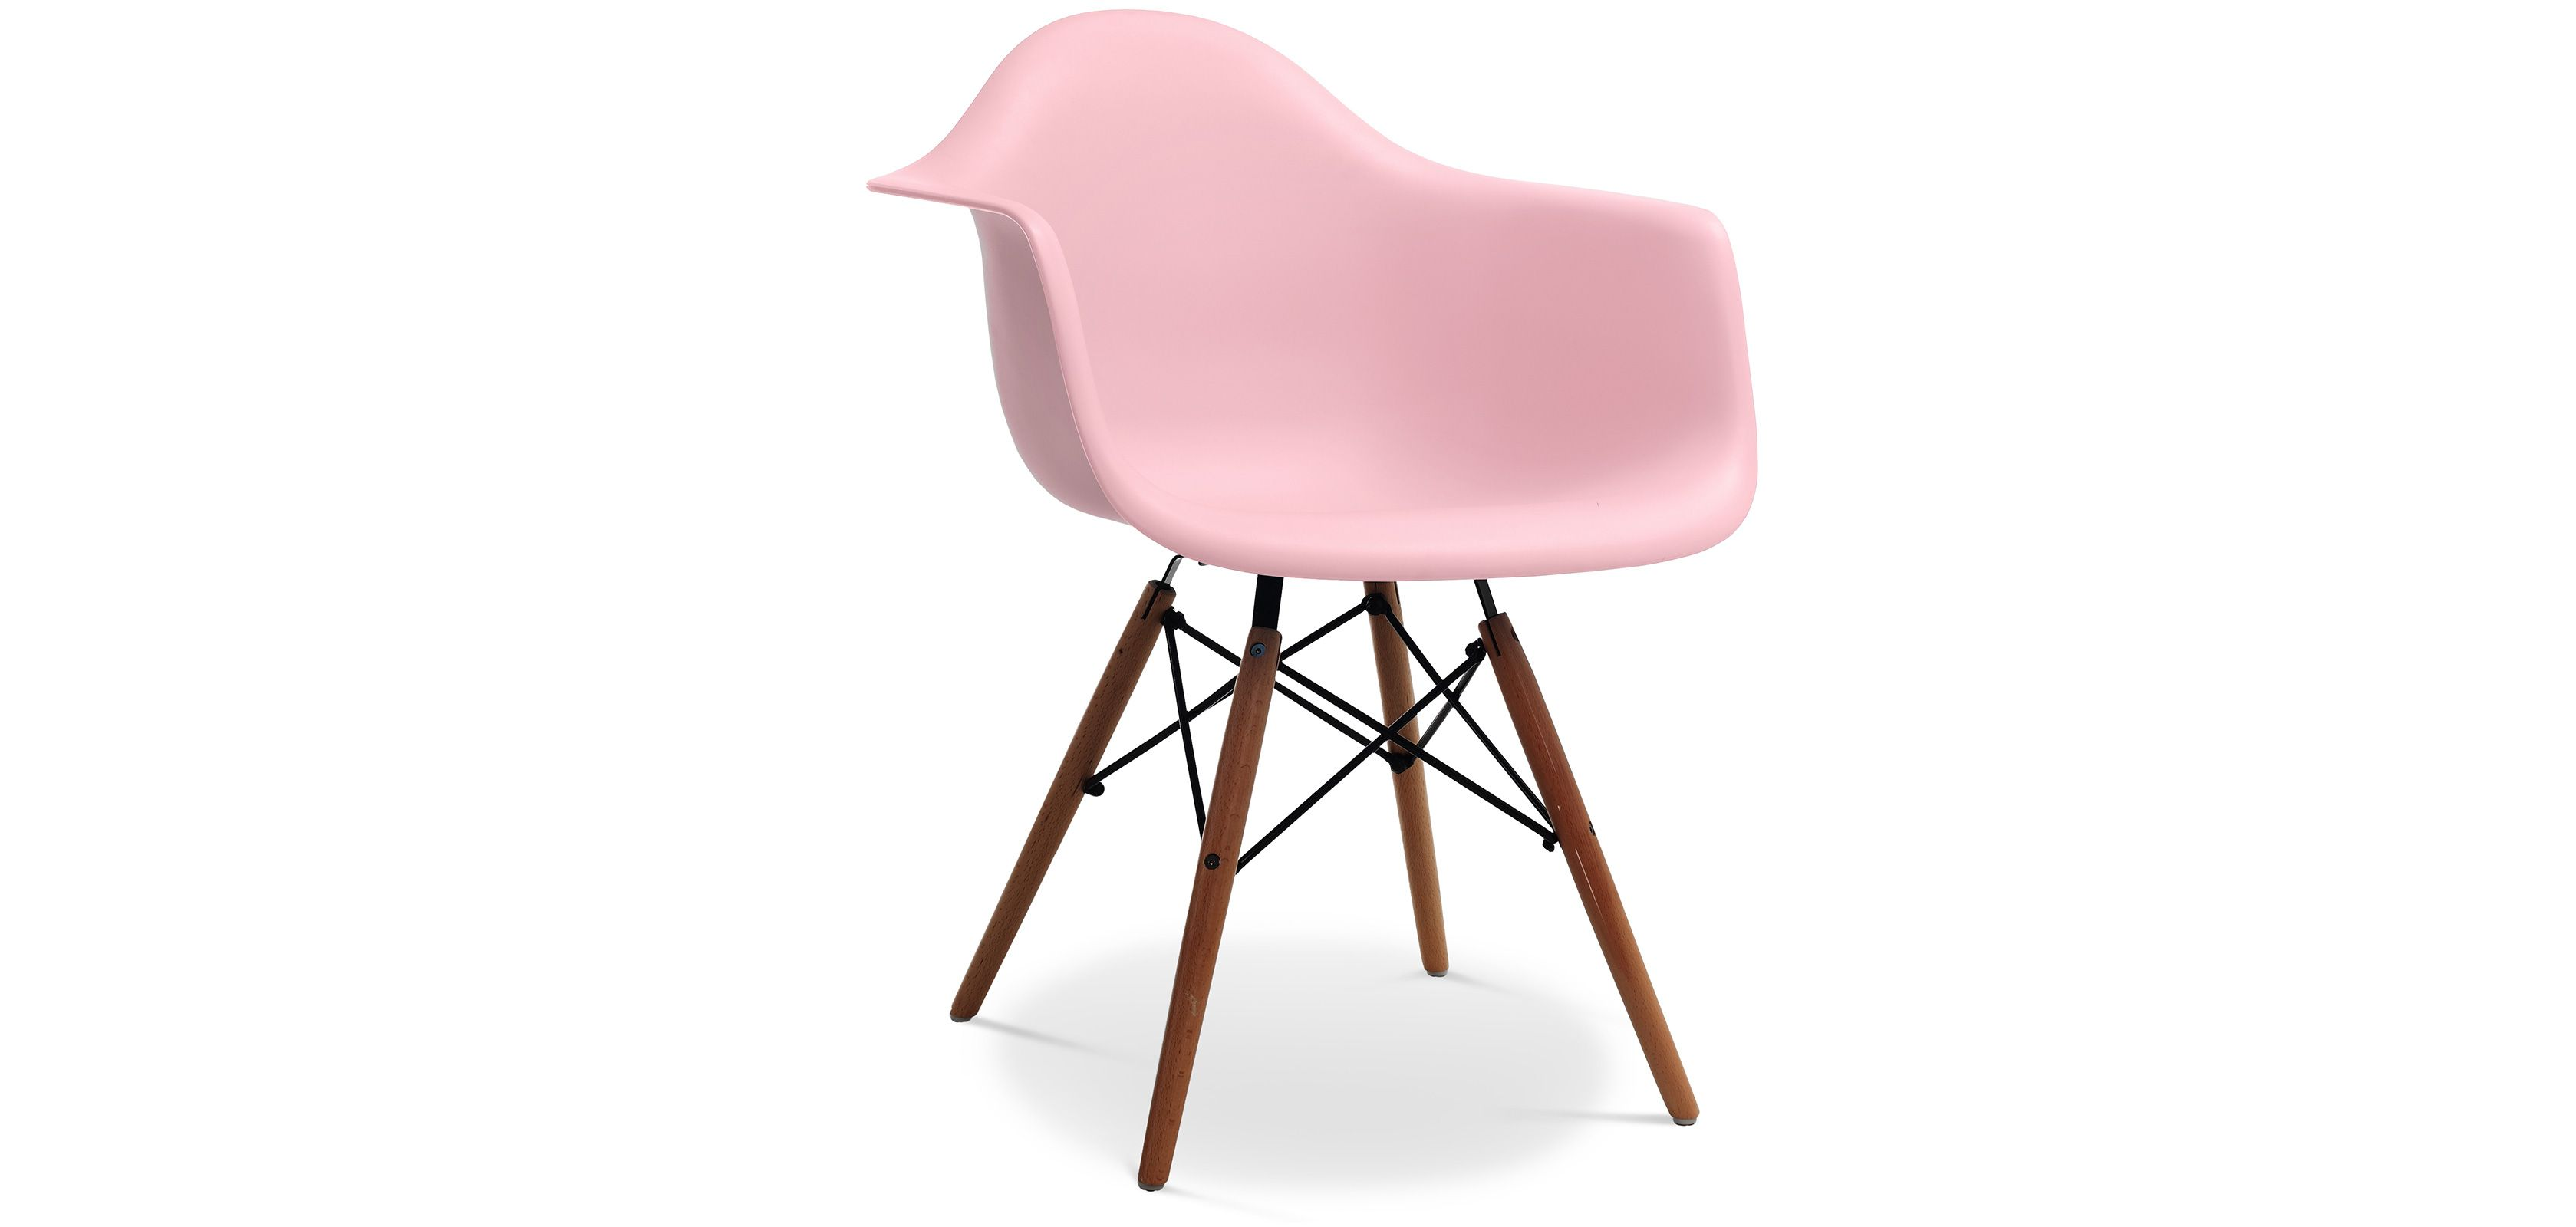 Chaise DAW Piètement foncé Charles Eames Style - Polypropylène Matt ...